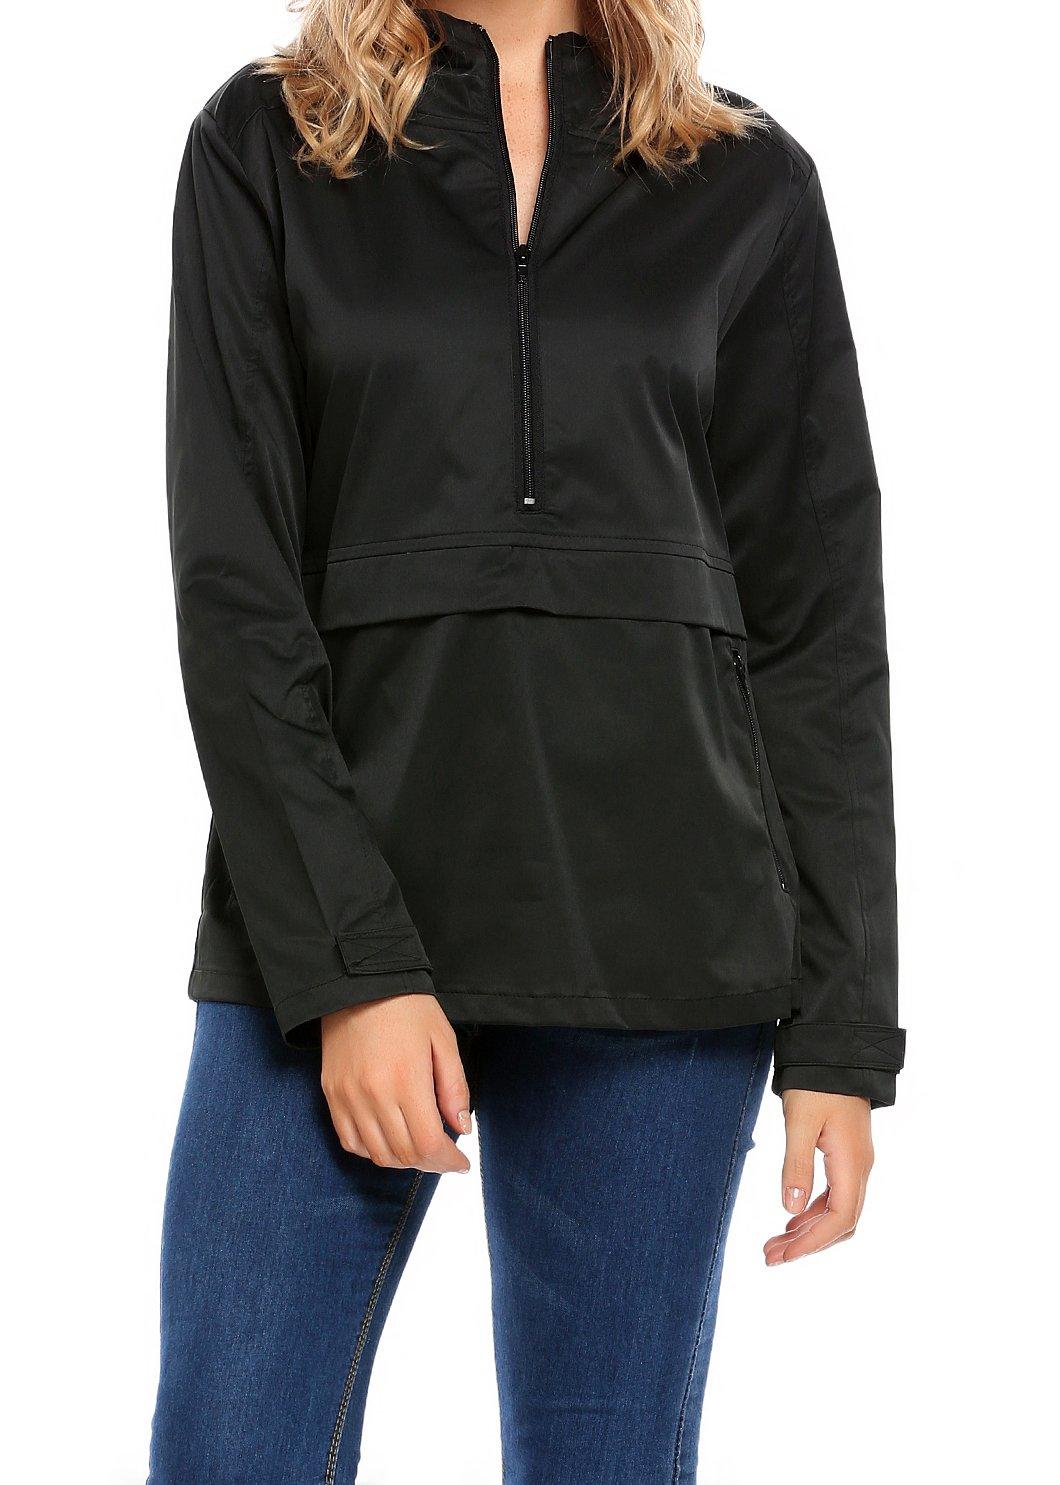 SummerRio Women Front-Zip Hooded Waterproof Plus Size Rain Jacket (Black,X-Large)